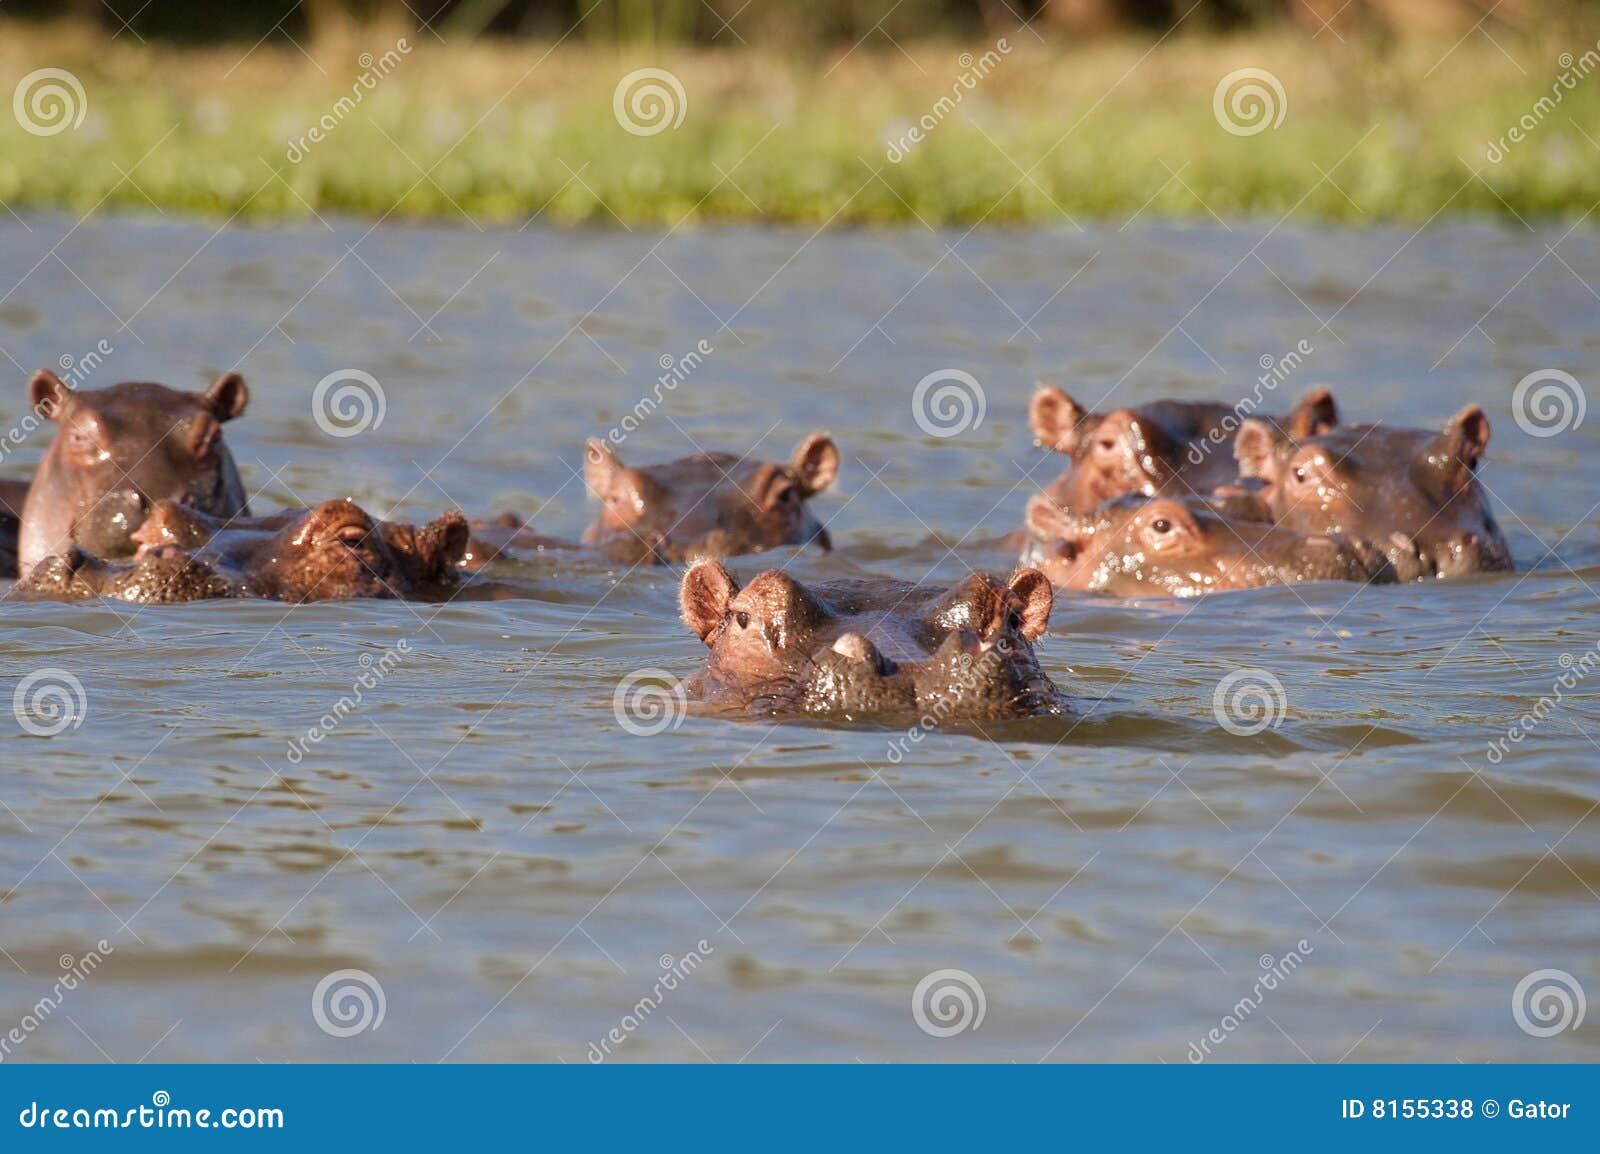 hippopotamus eating grass